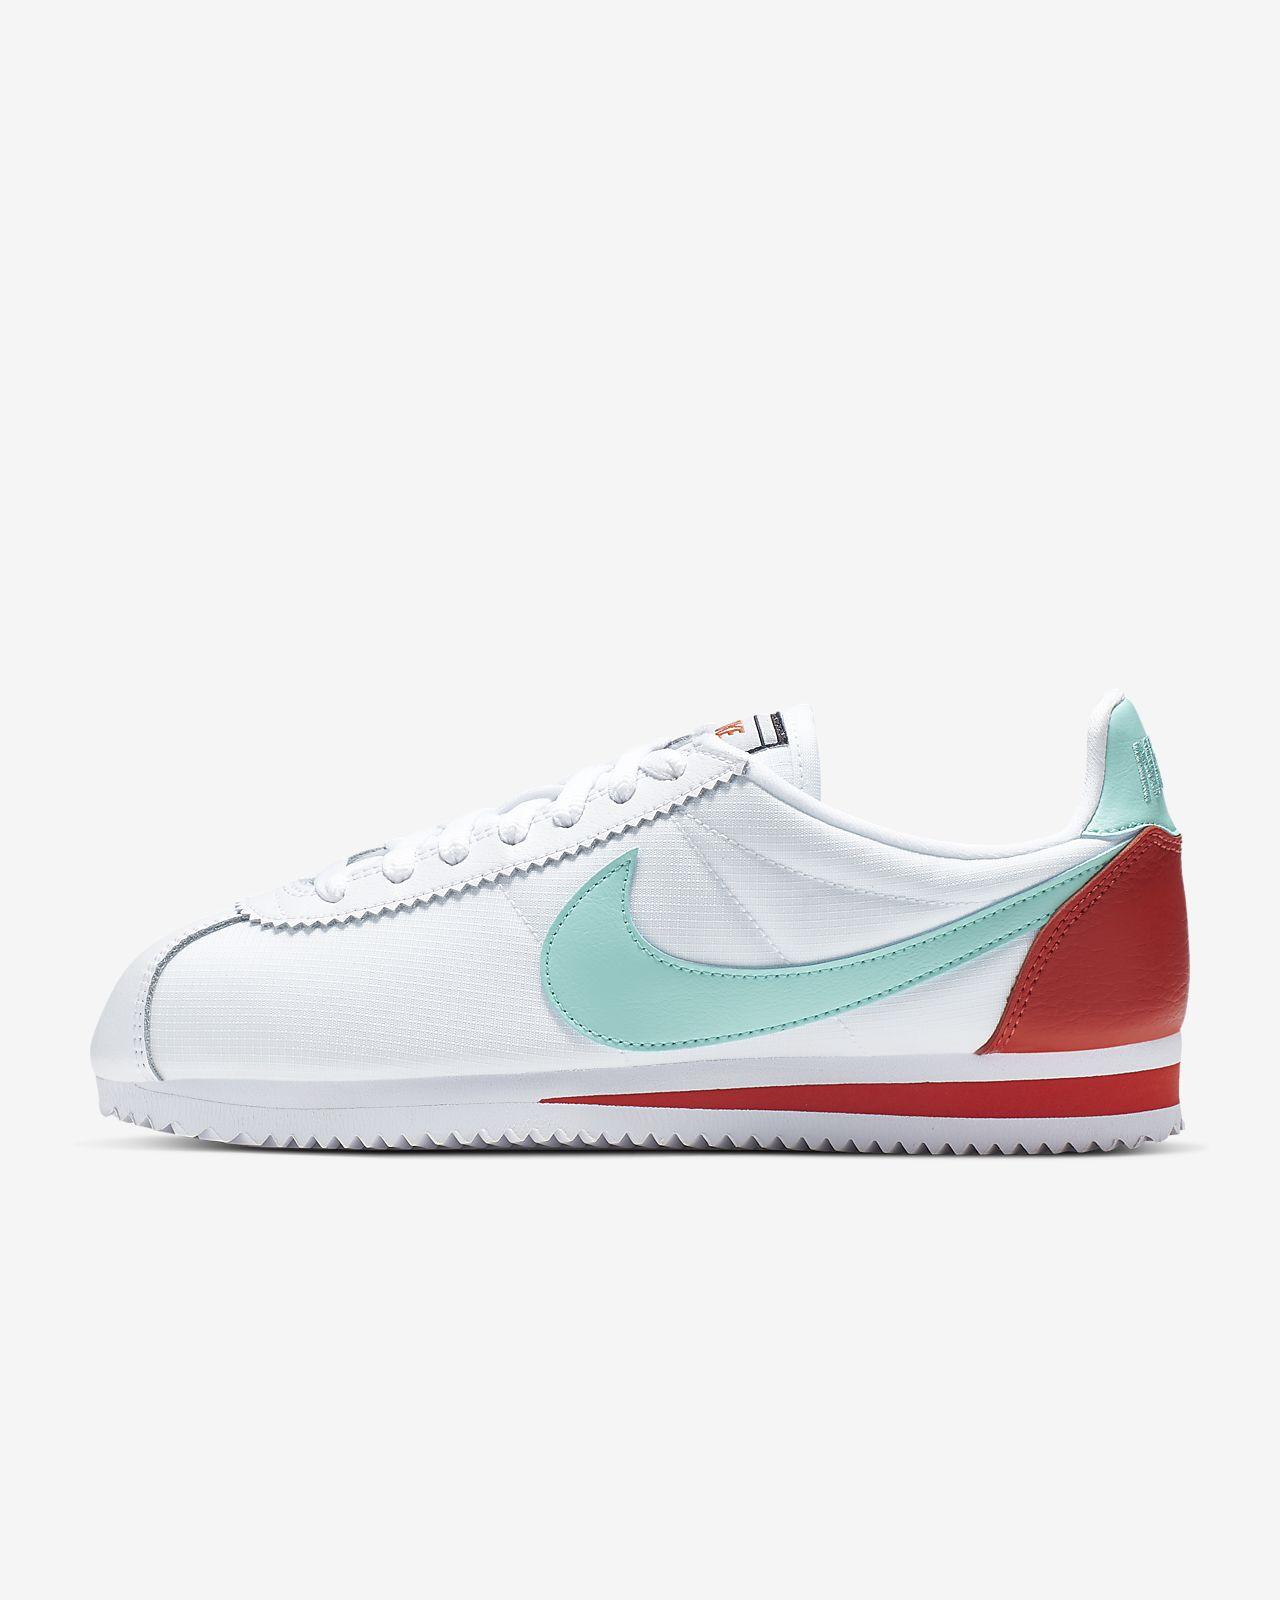 Nike Classic Cortez Premium Women's Shoe